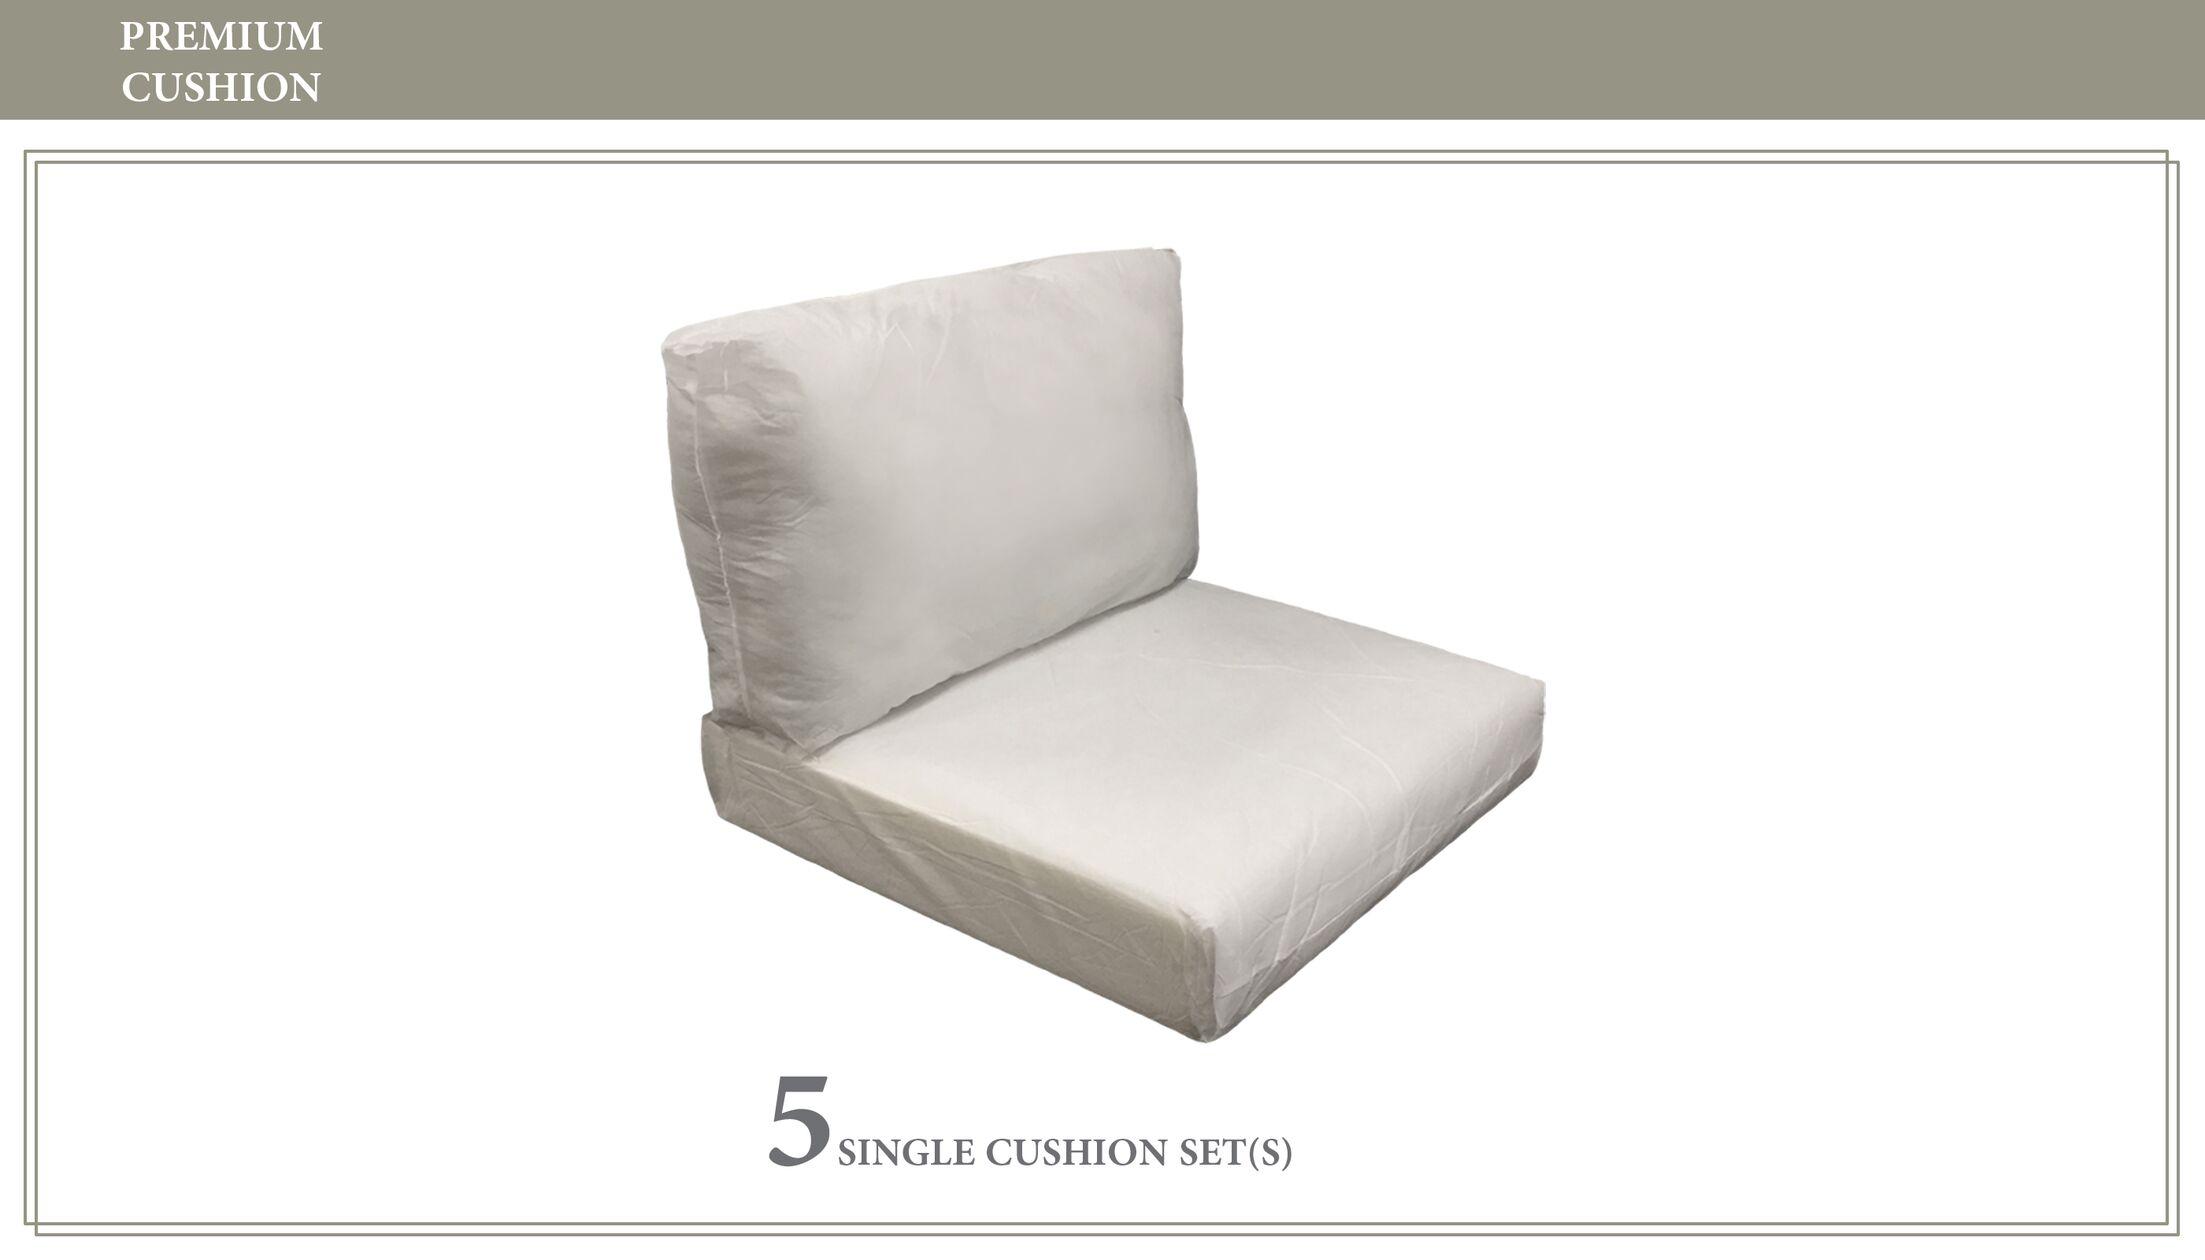 Fairmont 10 Piece Outdoor Lounge Chair Cushion Set